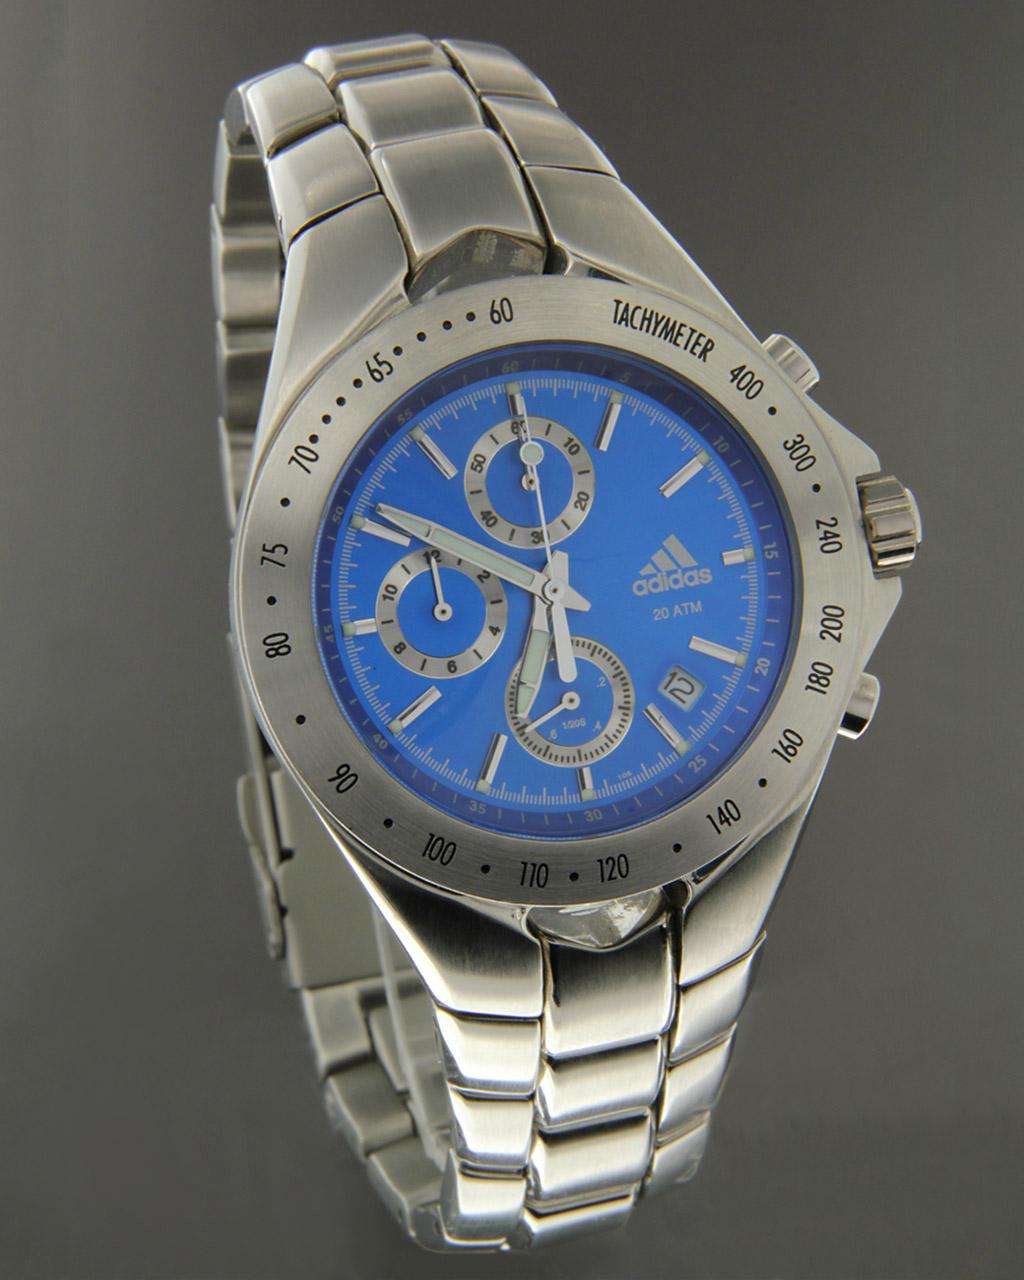 ADIDAS Ρολόι 10-0136   προσφορεσ ρολόγια ρολόγια απο 300 έως 500ε